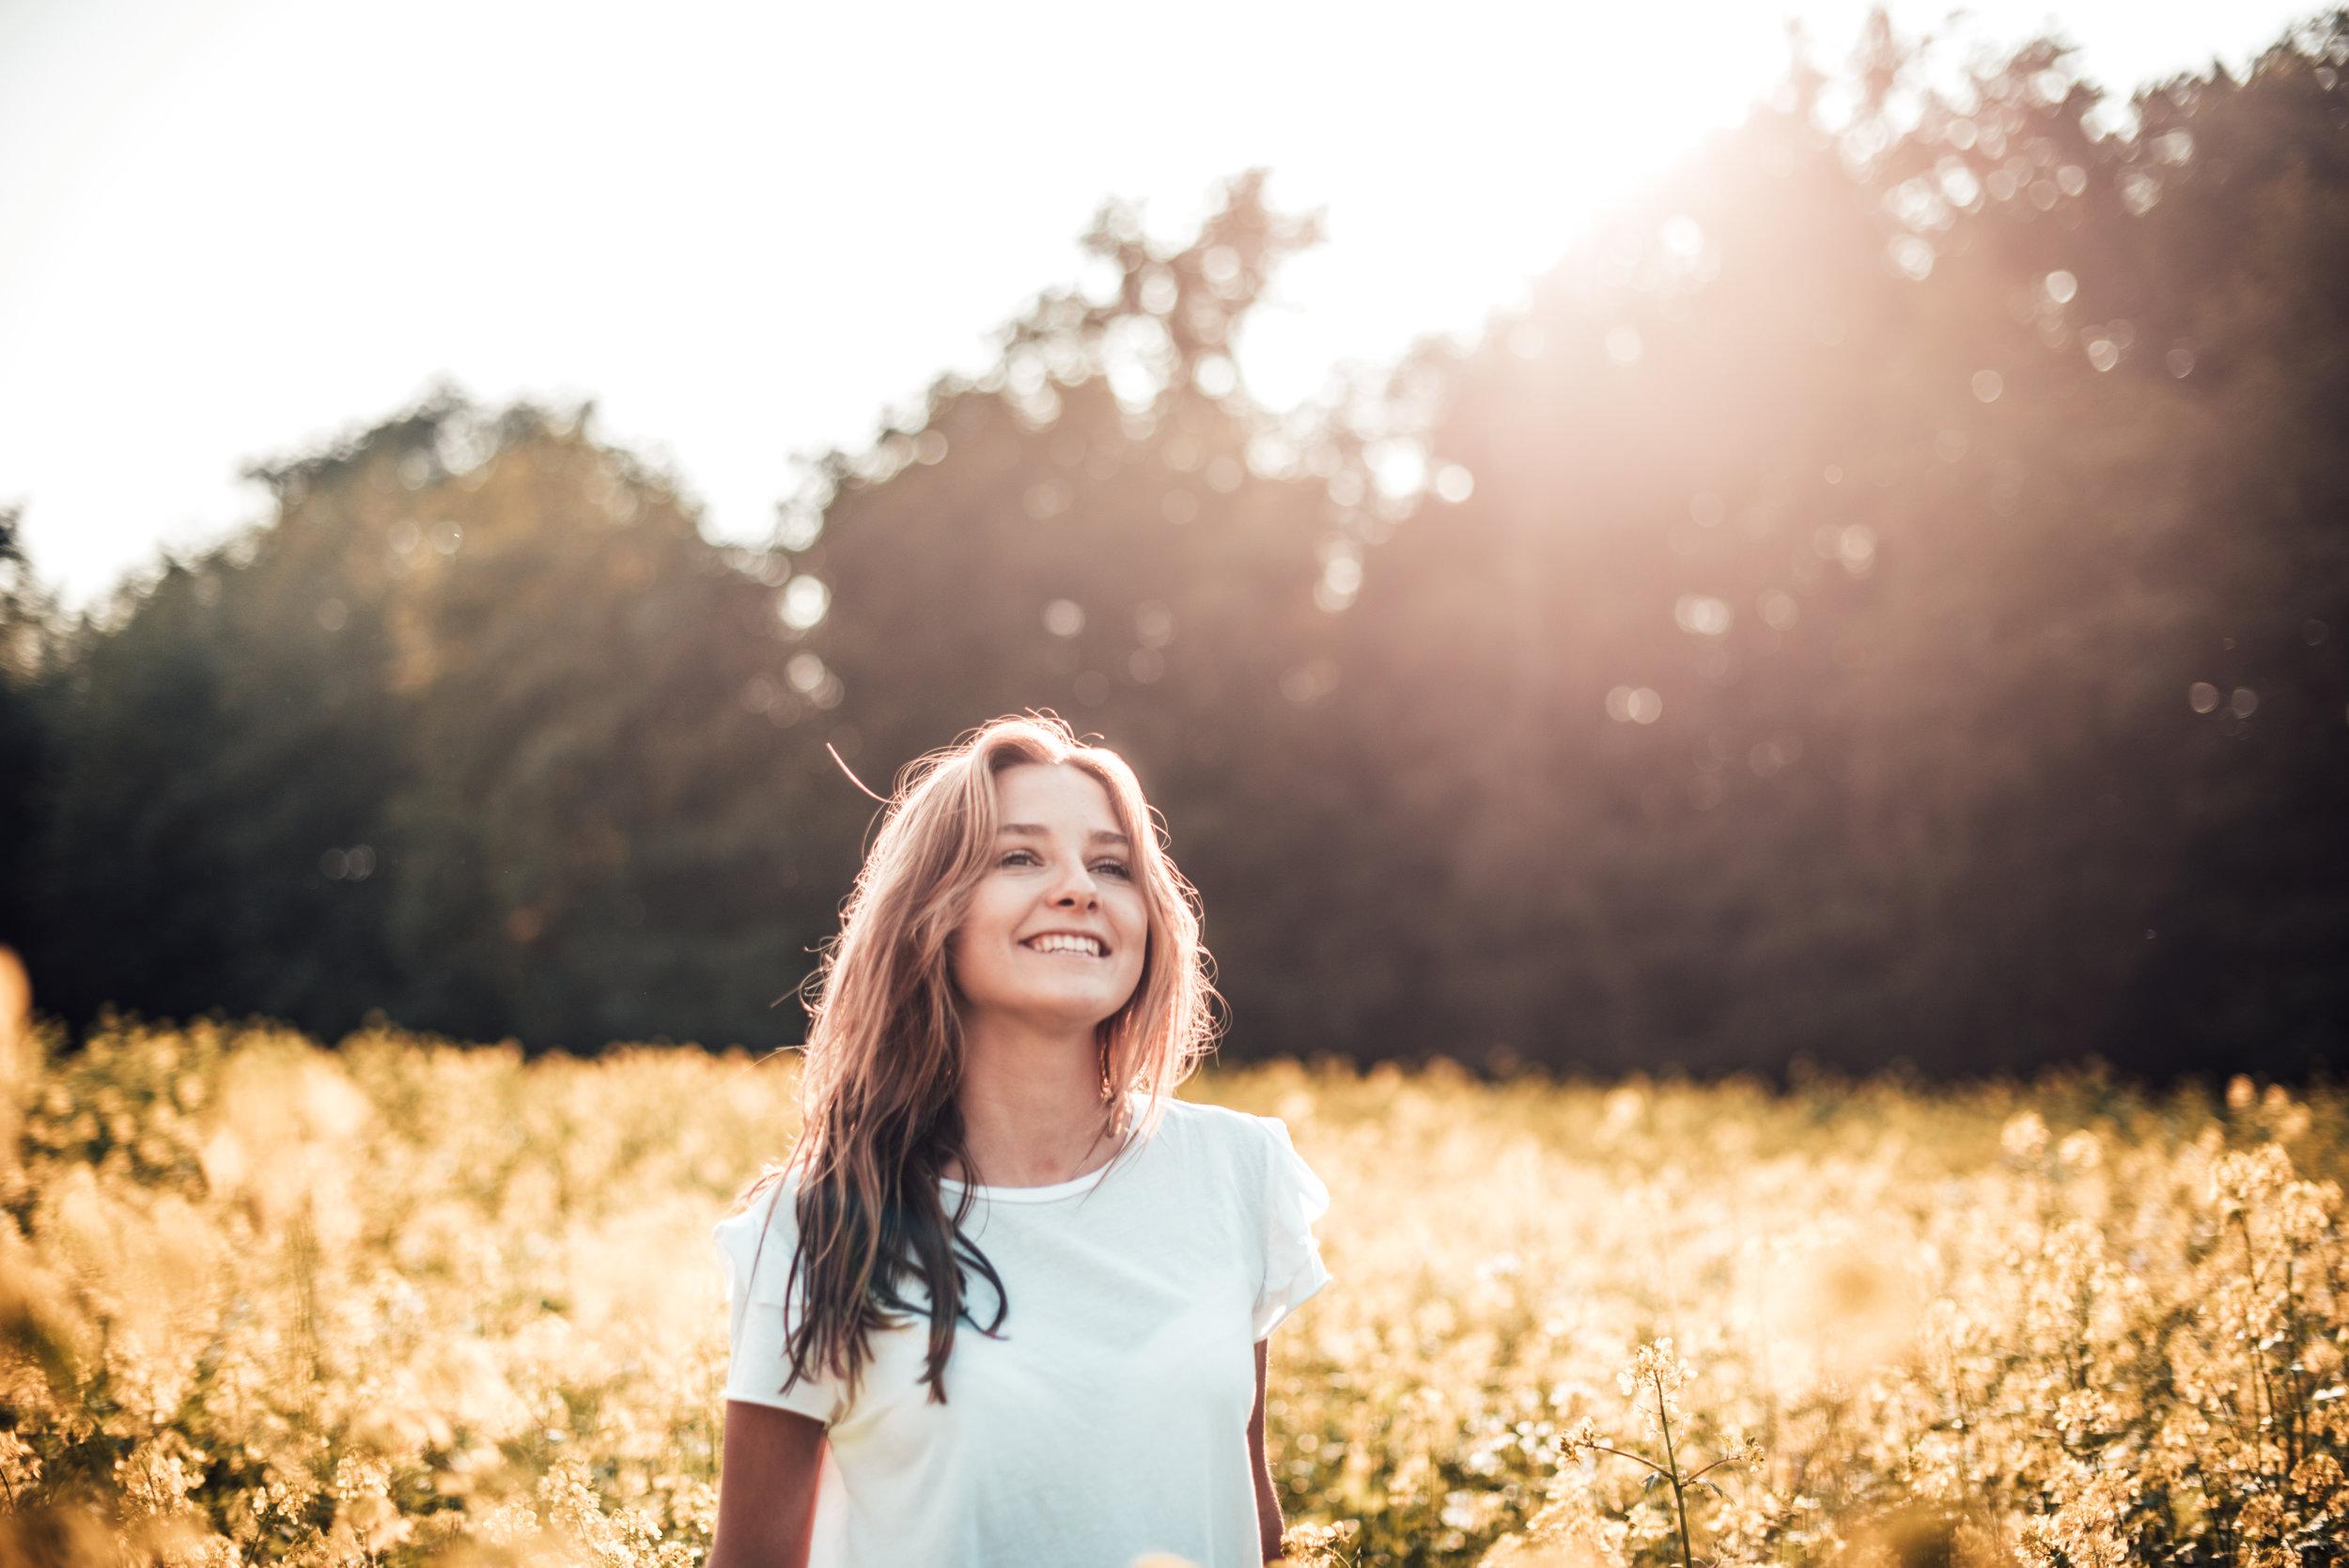 gretacaptures-goldenhour-shooting-sunset-photography-münster